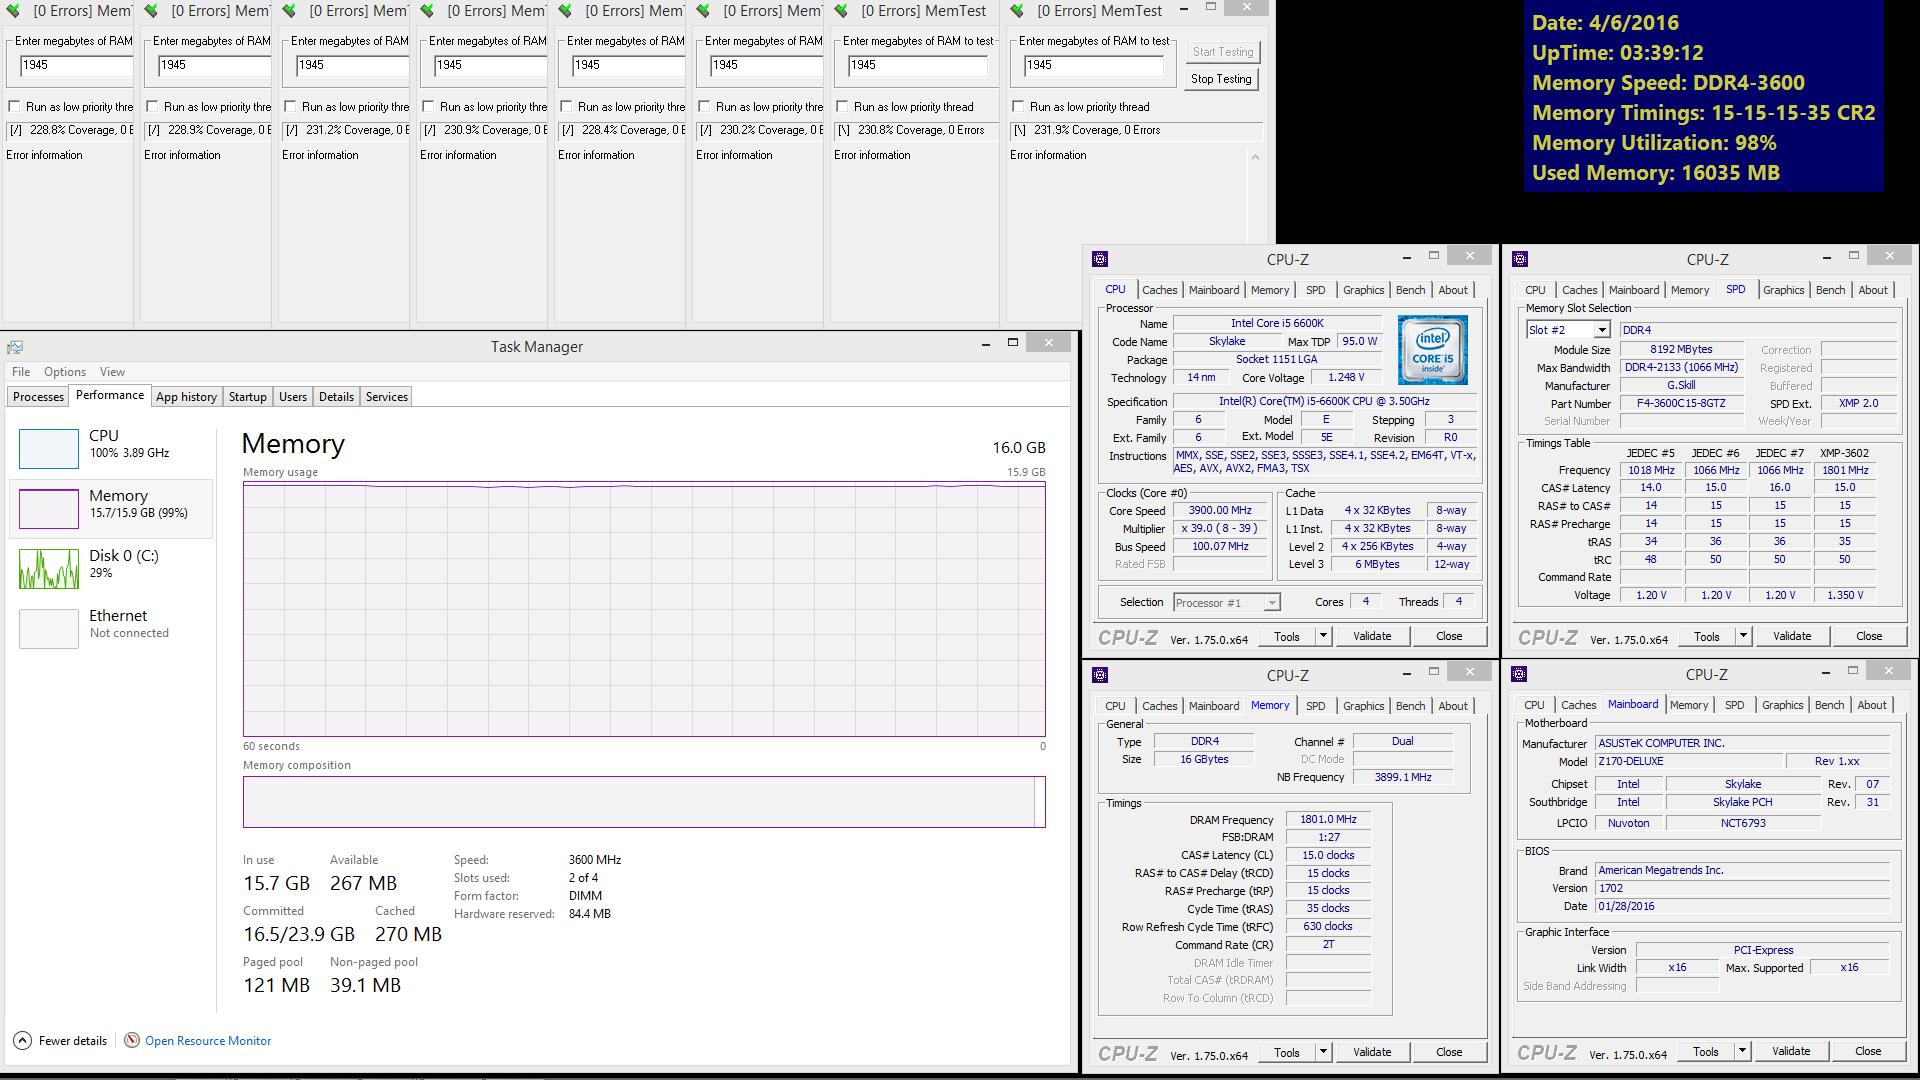 G SKILL unveils Trident Z DDR4-3600MHz 16GB (2x8GB) CL15